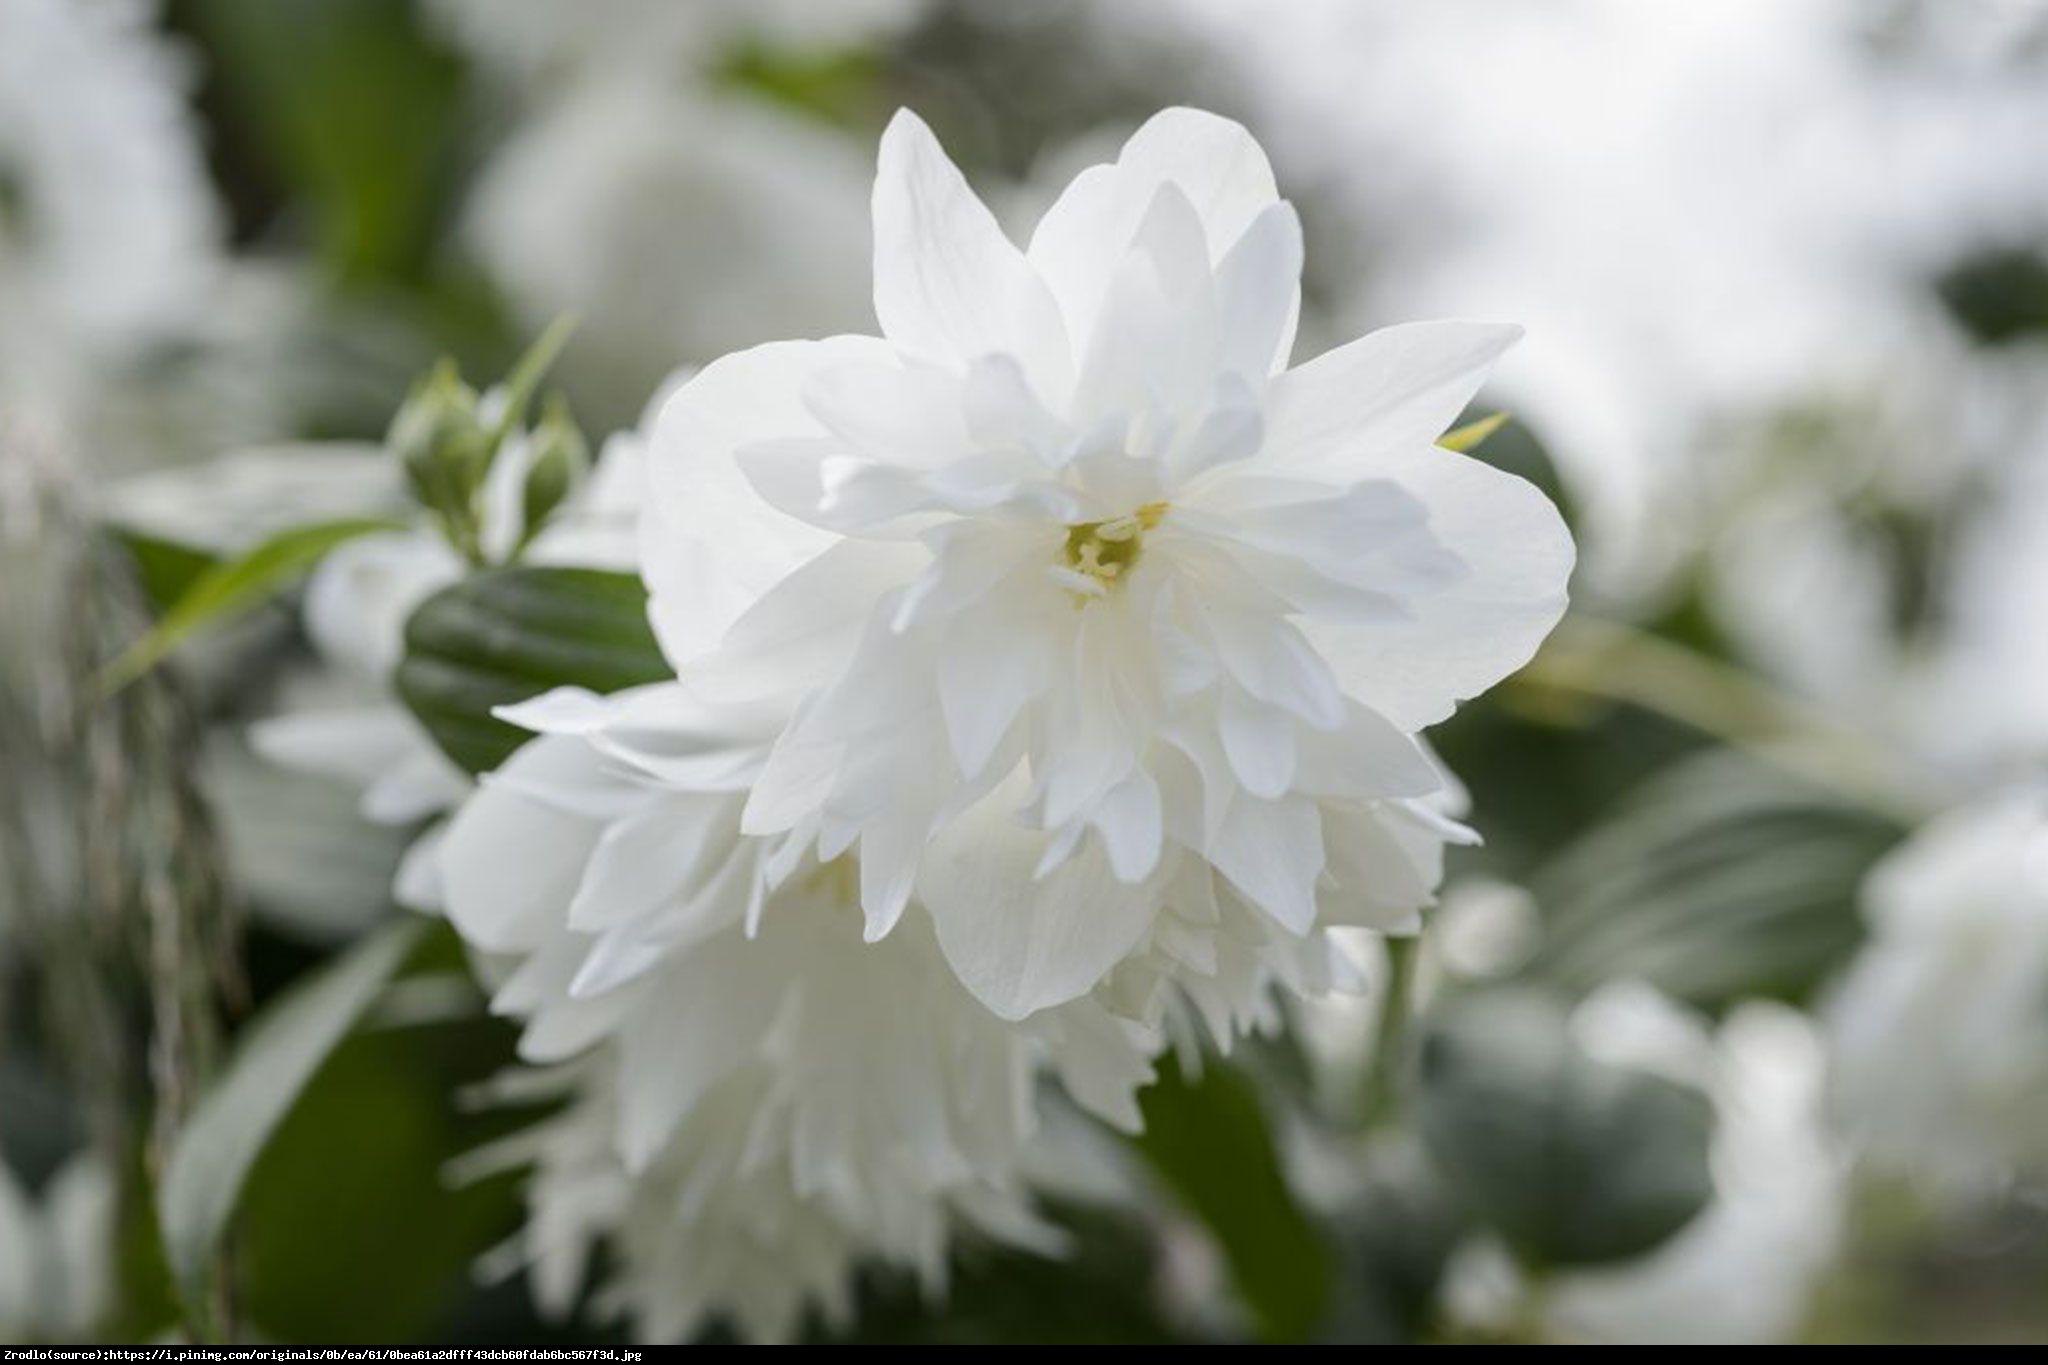 Jaśminowiec minnesota snowflake - philadelphus minnesota snowflake